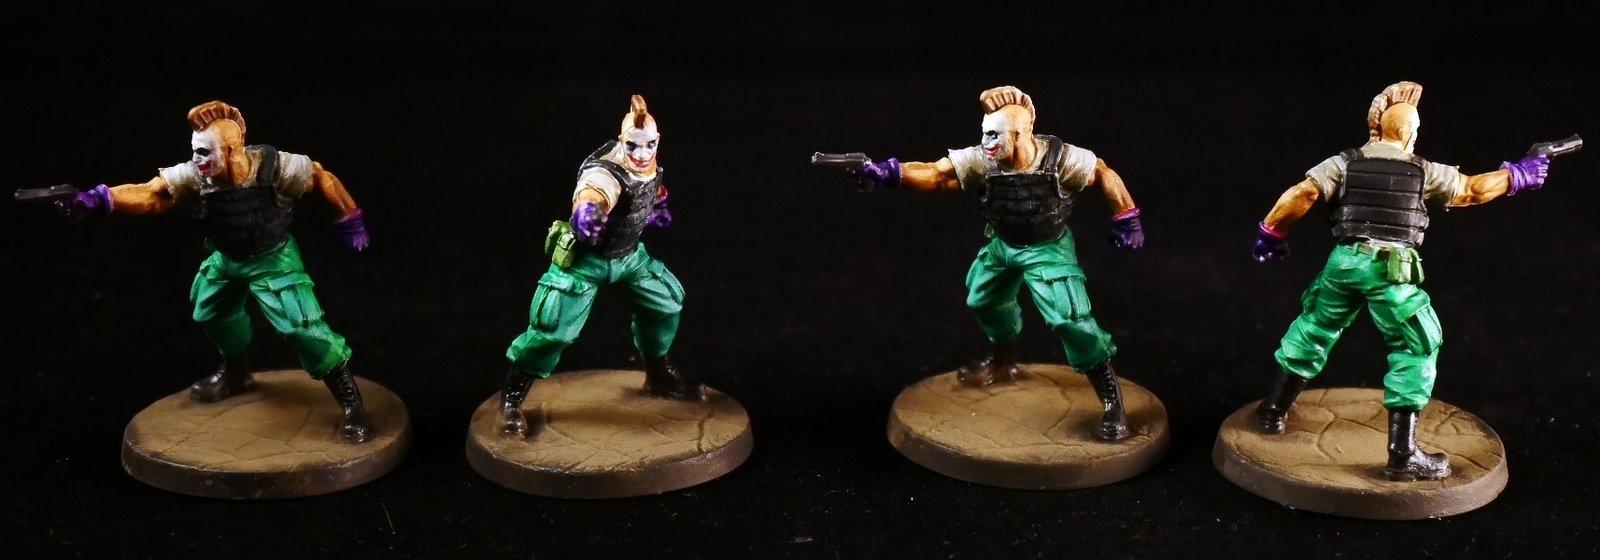 arkham asylum joker s gang with handgun paulonium mai 2021.jpg